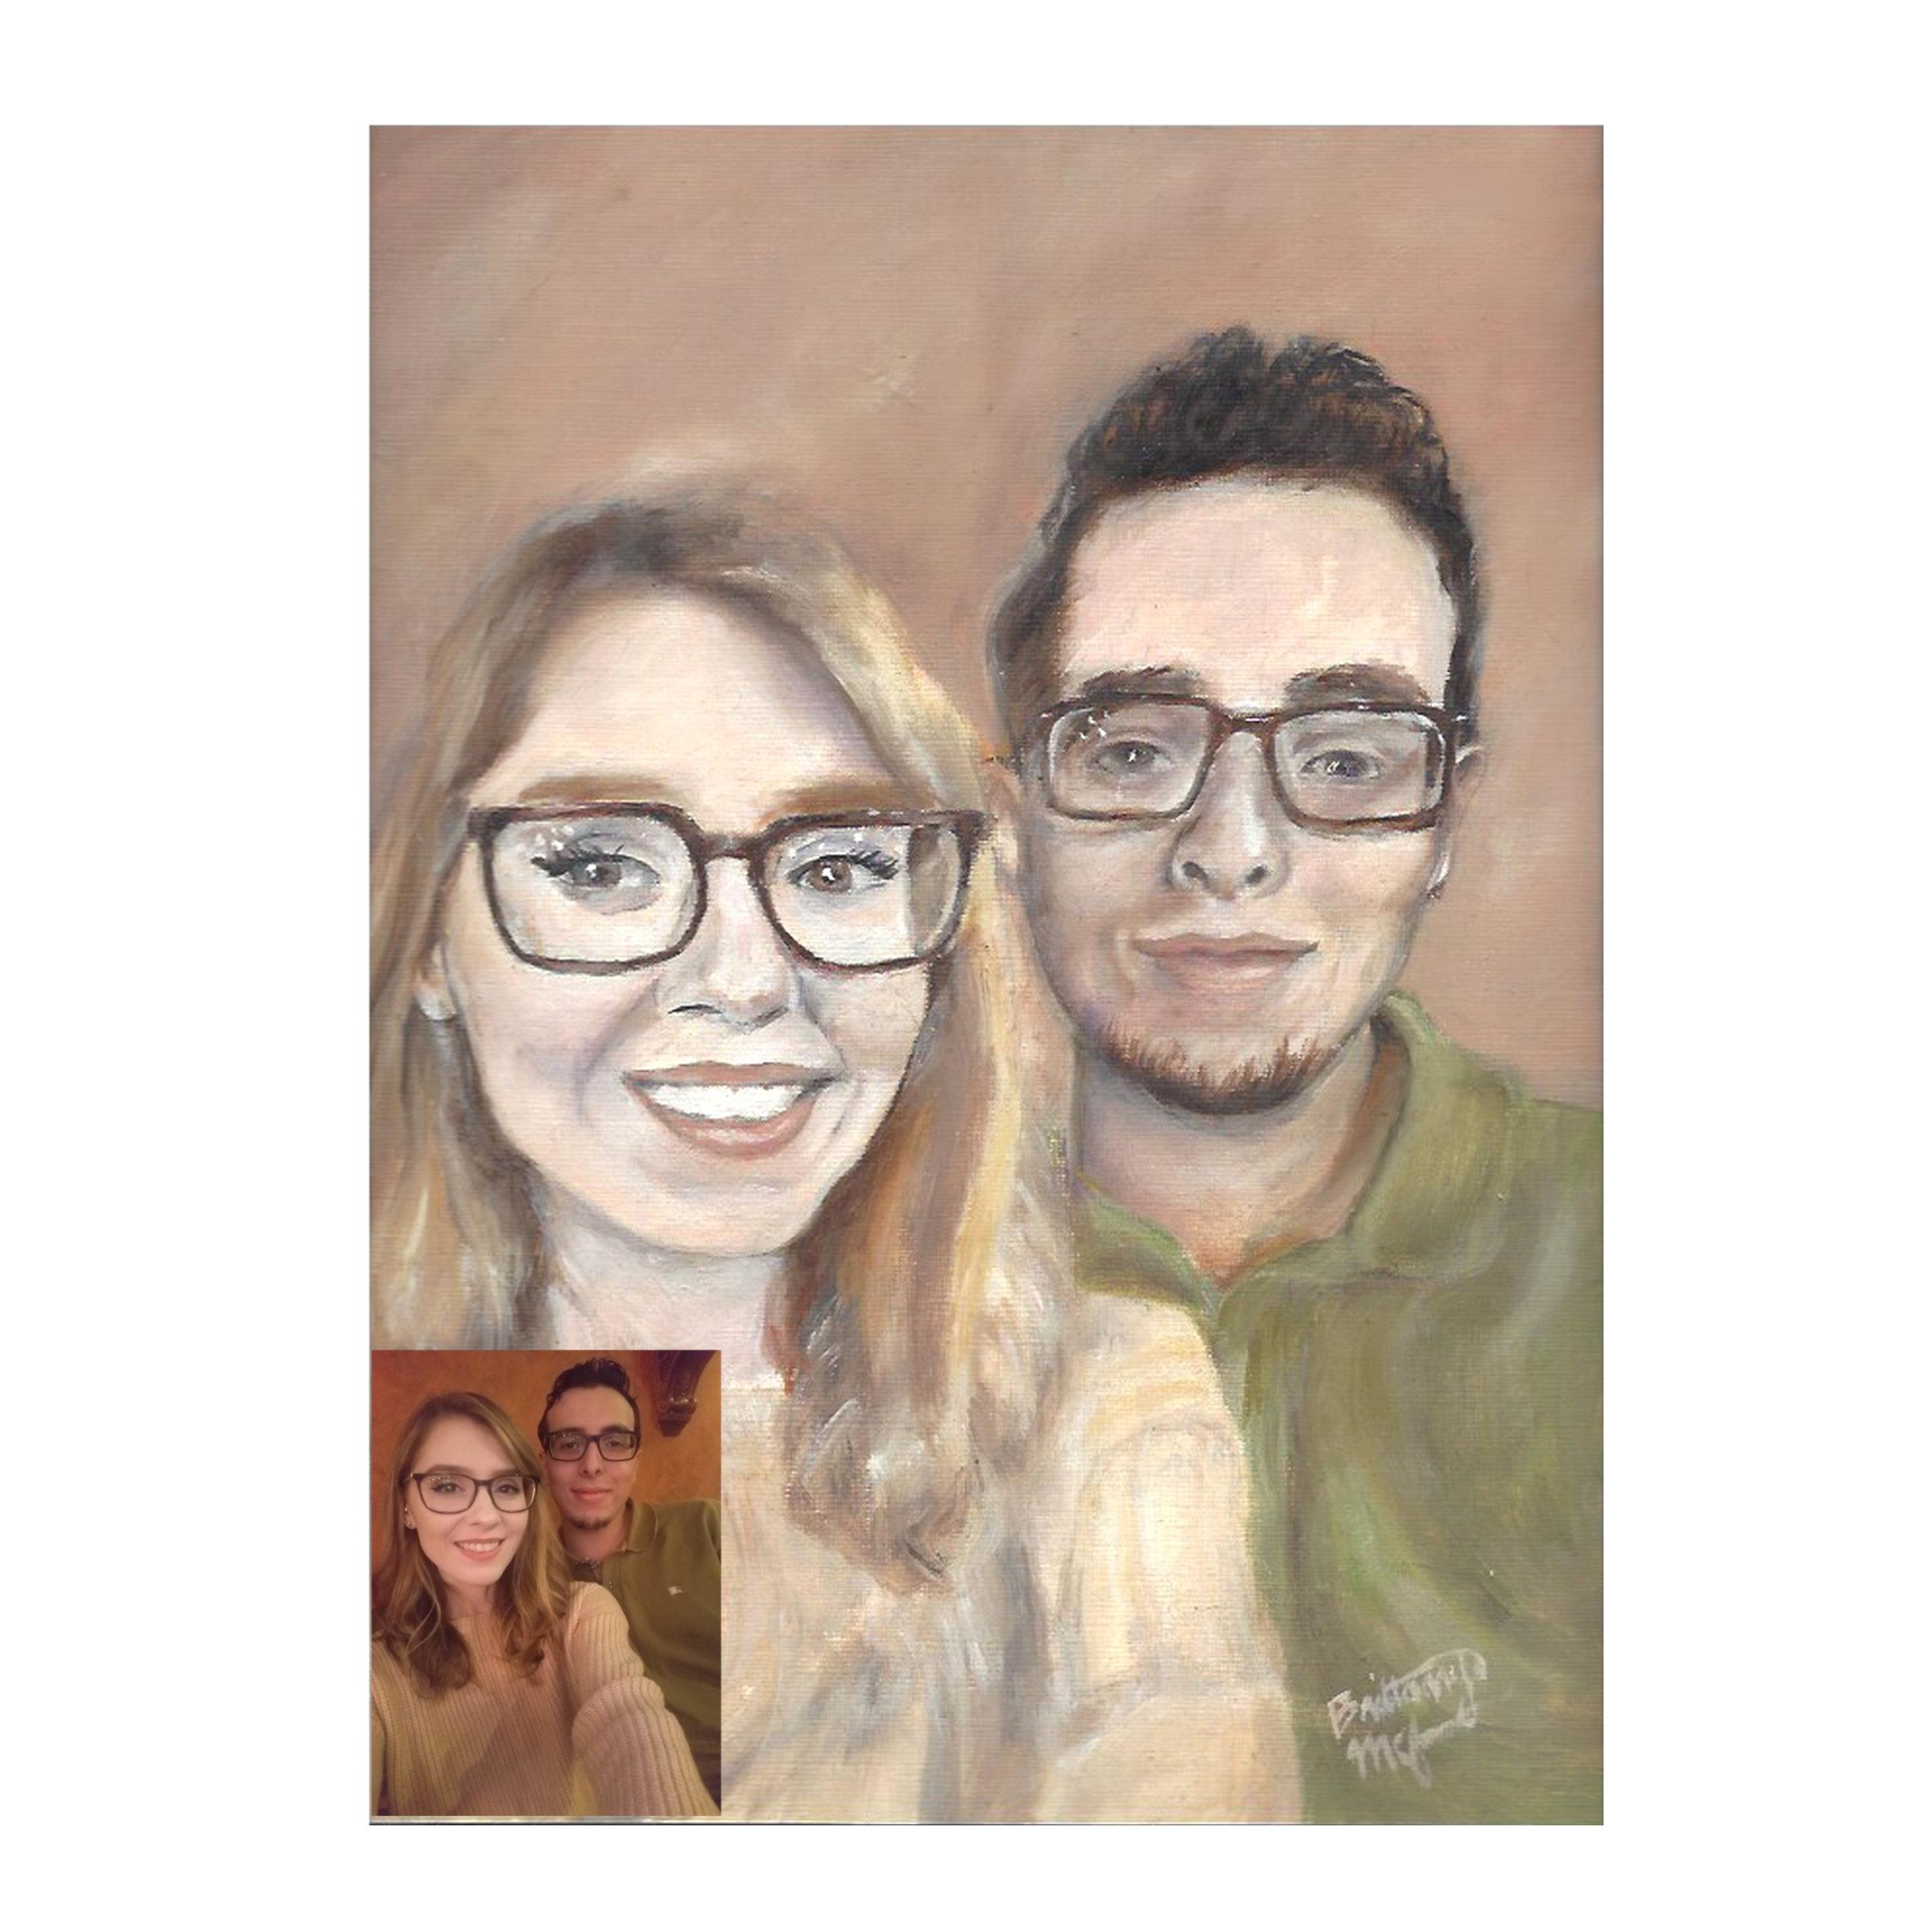 Elly & Boyfriend Portrait with icon Square.jpg